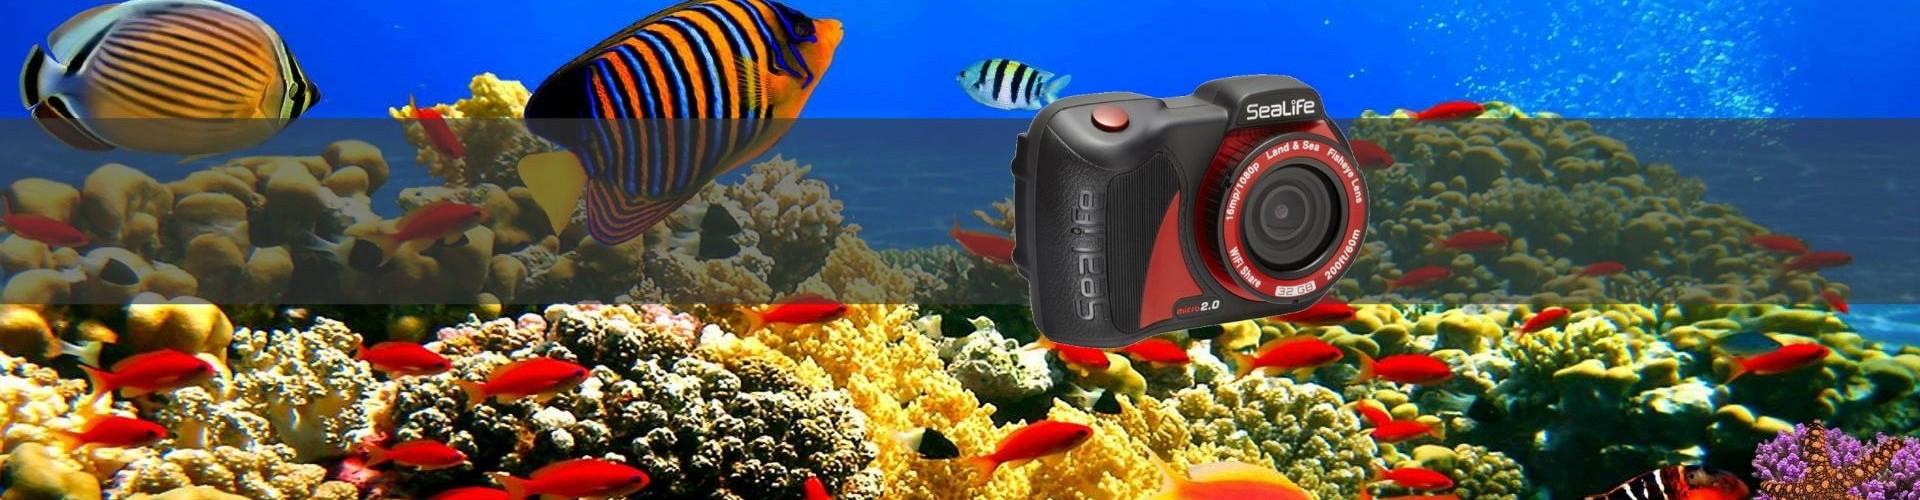 Sealife Camera Demo